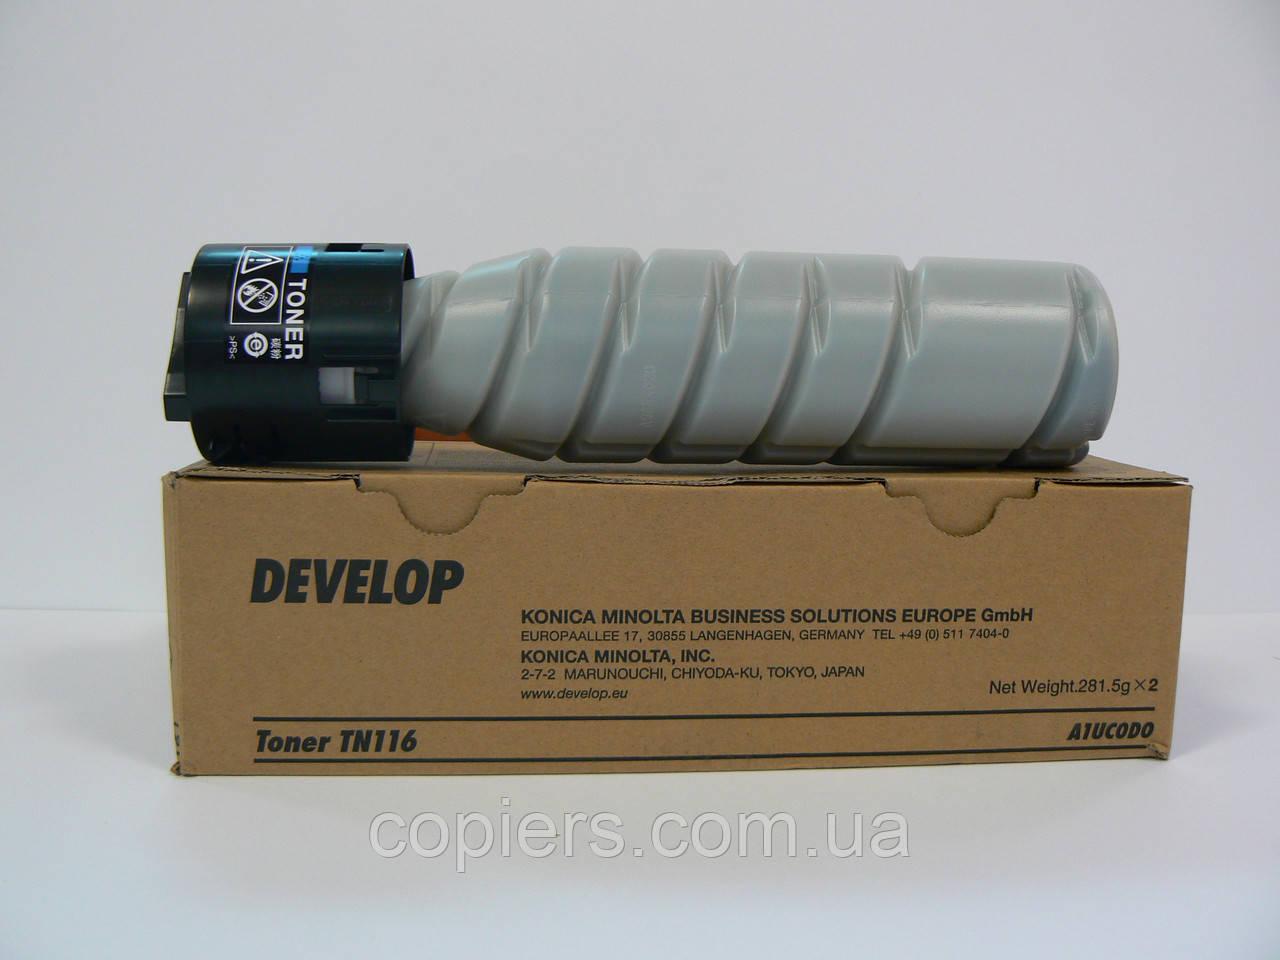 TN116 Develop тoнер картридж  Develop 164/165/184/185, оригинал, TN-116